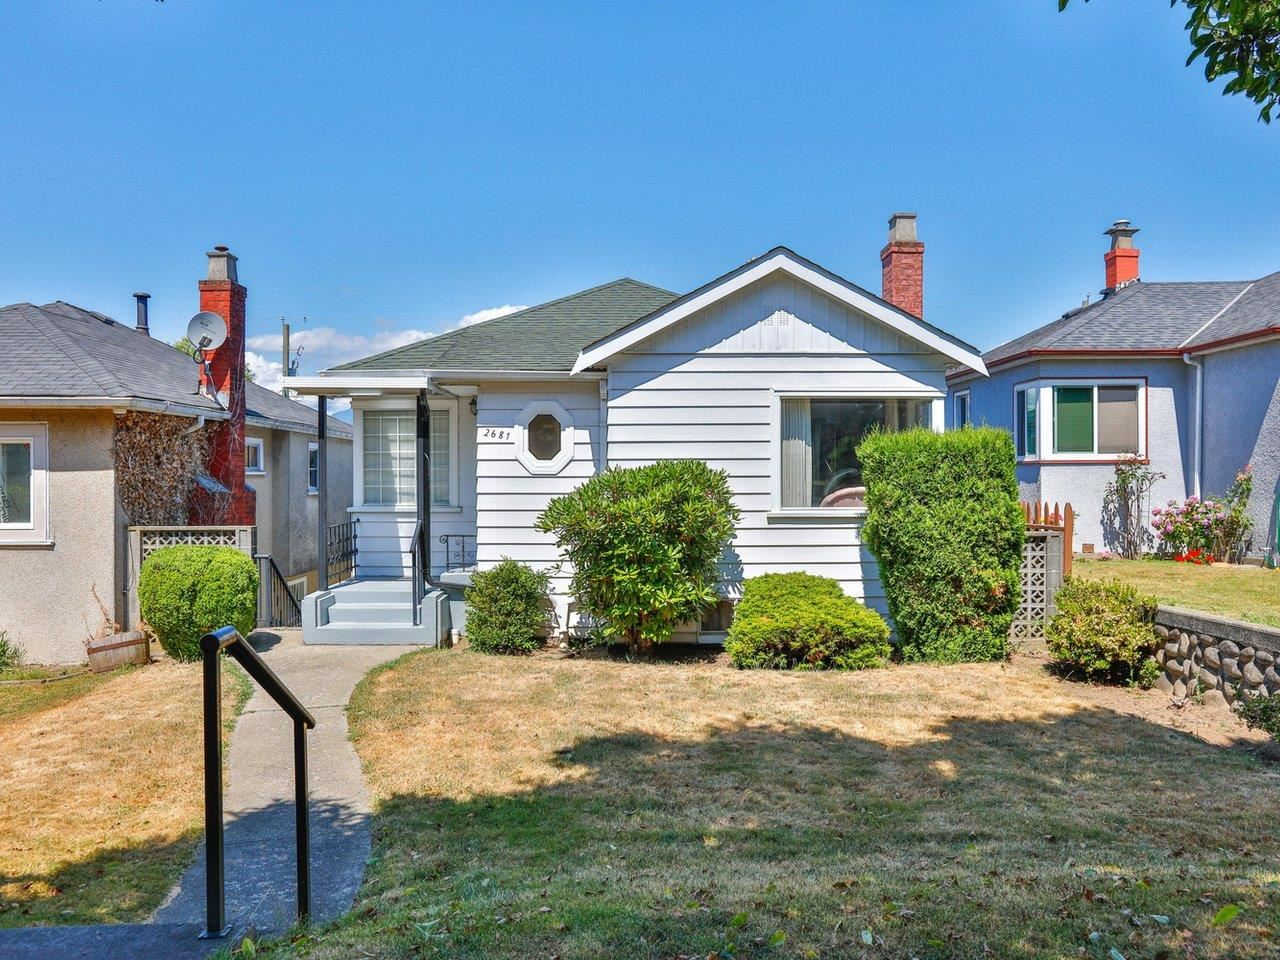 2681 E 4TH AVENUE - Renfrew VE House/Single Family for sale, 4 Bedrooms (R2605962) - #1